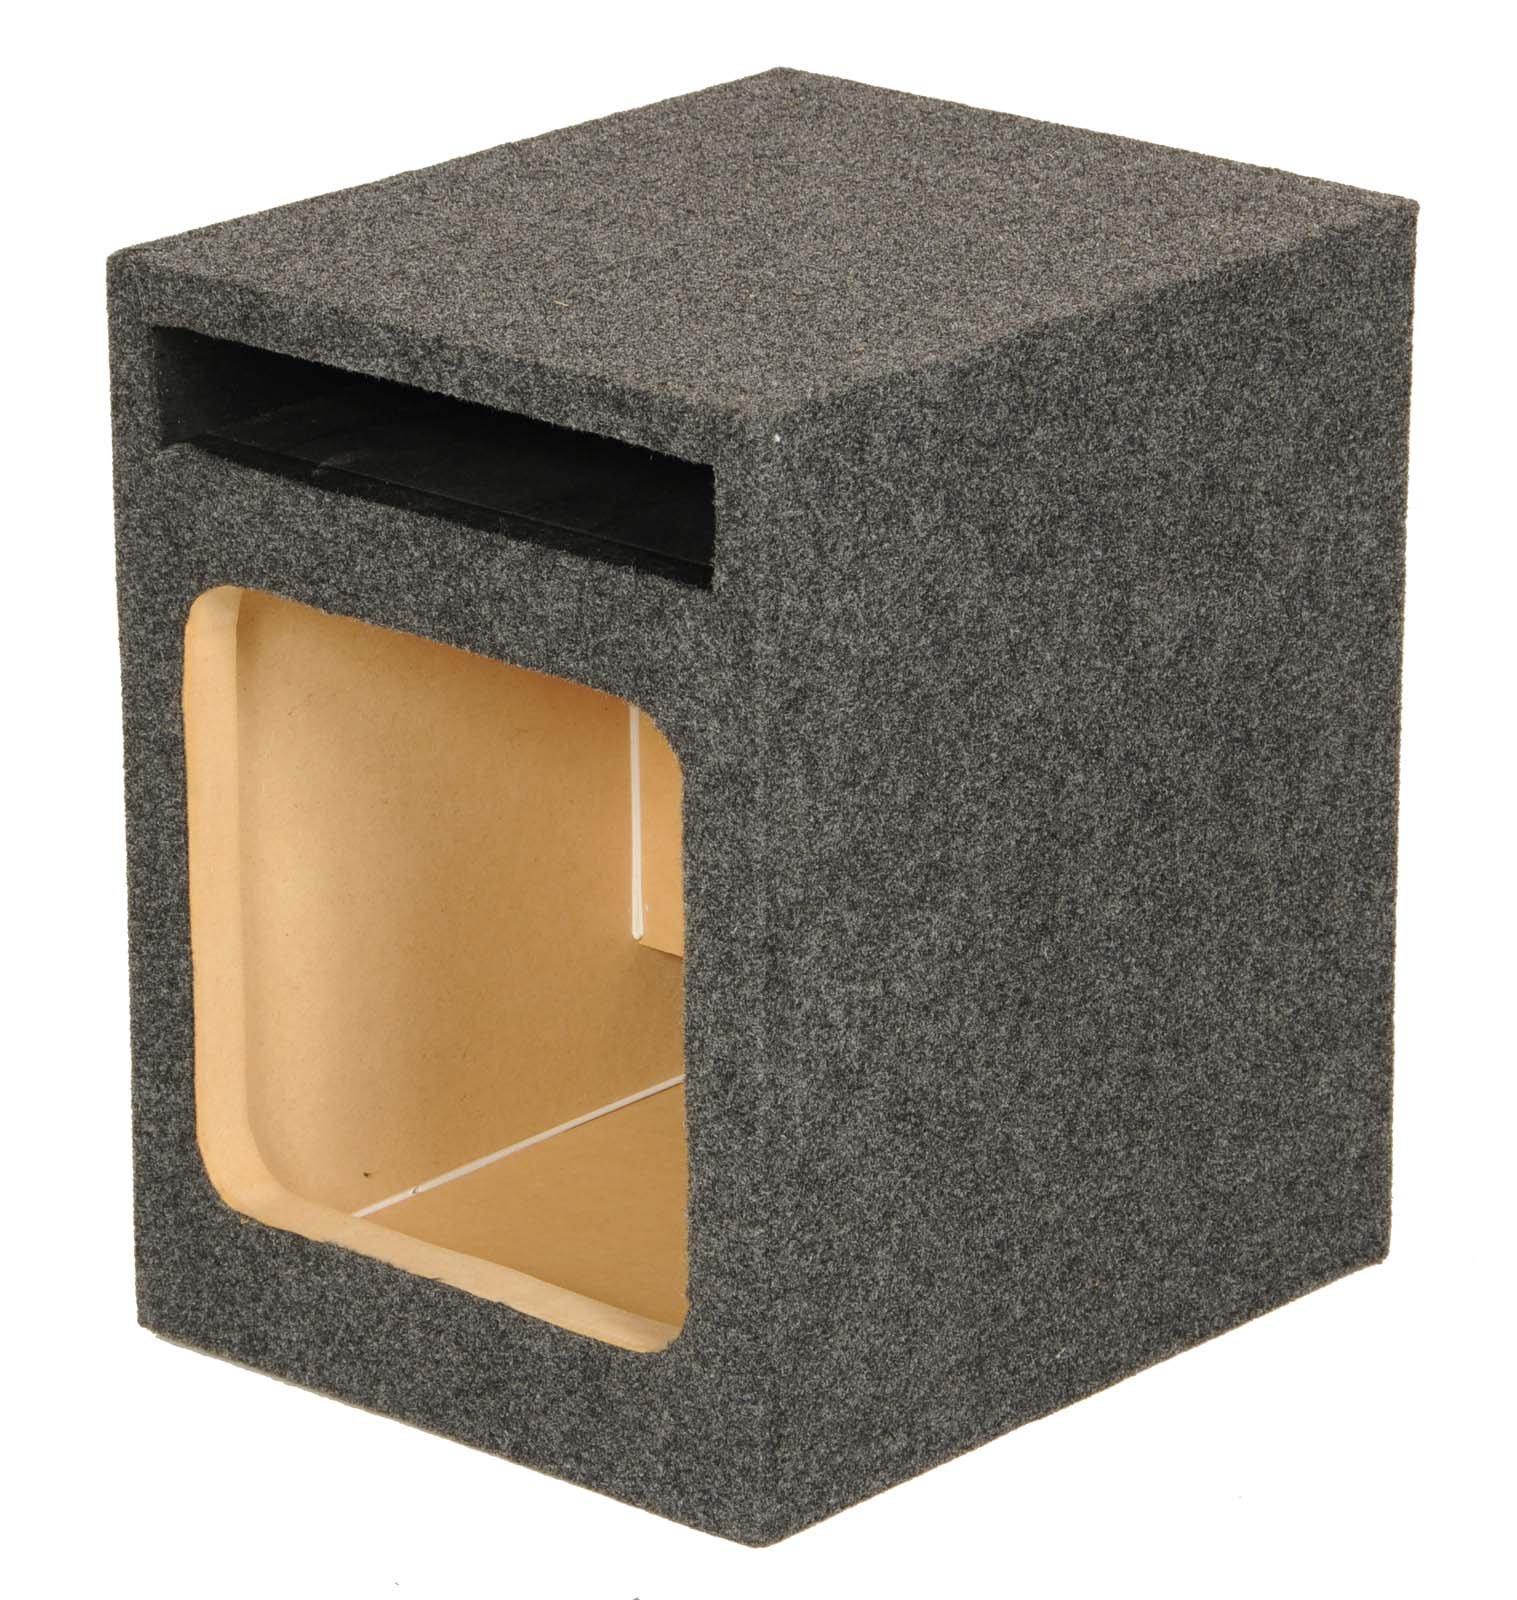 Q Power HD110 VENT SQ 10'' Square Vented Box